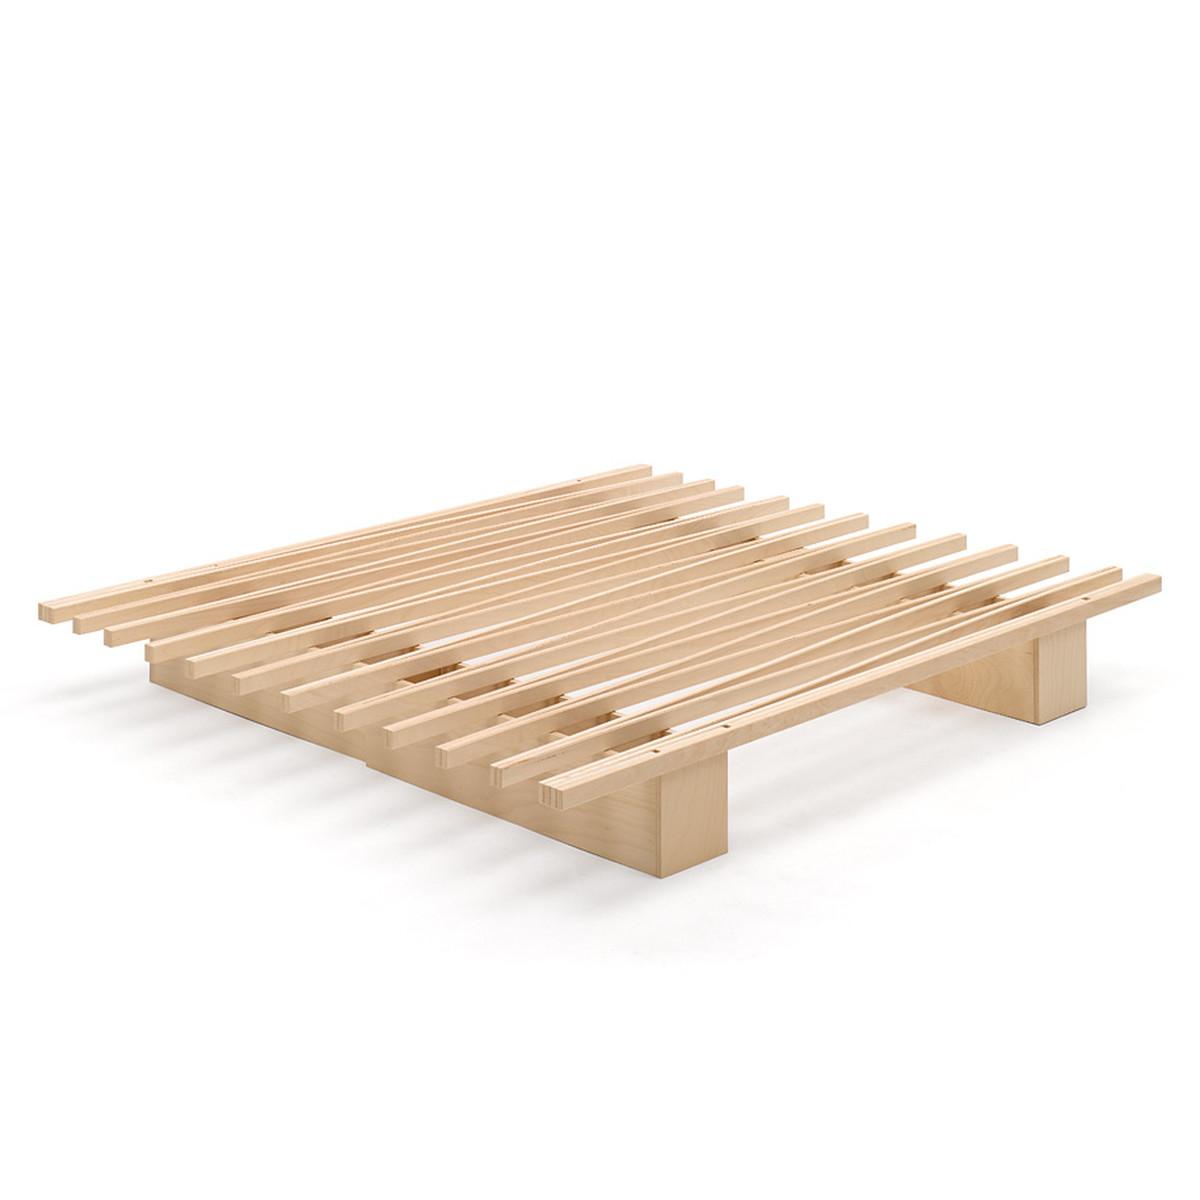 Full Size of Bett Design Holz V Tojo Shop 180x200 Metall 200x200 Rückwand 140x200 Mit Bettkasten Fenster Alu Vollholzküche Dormiente Hunde Weiß Paletten Rausfallschutz Wohnzimmer Bett Design Holz